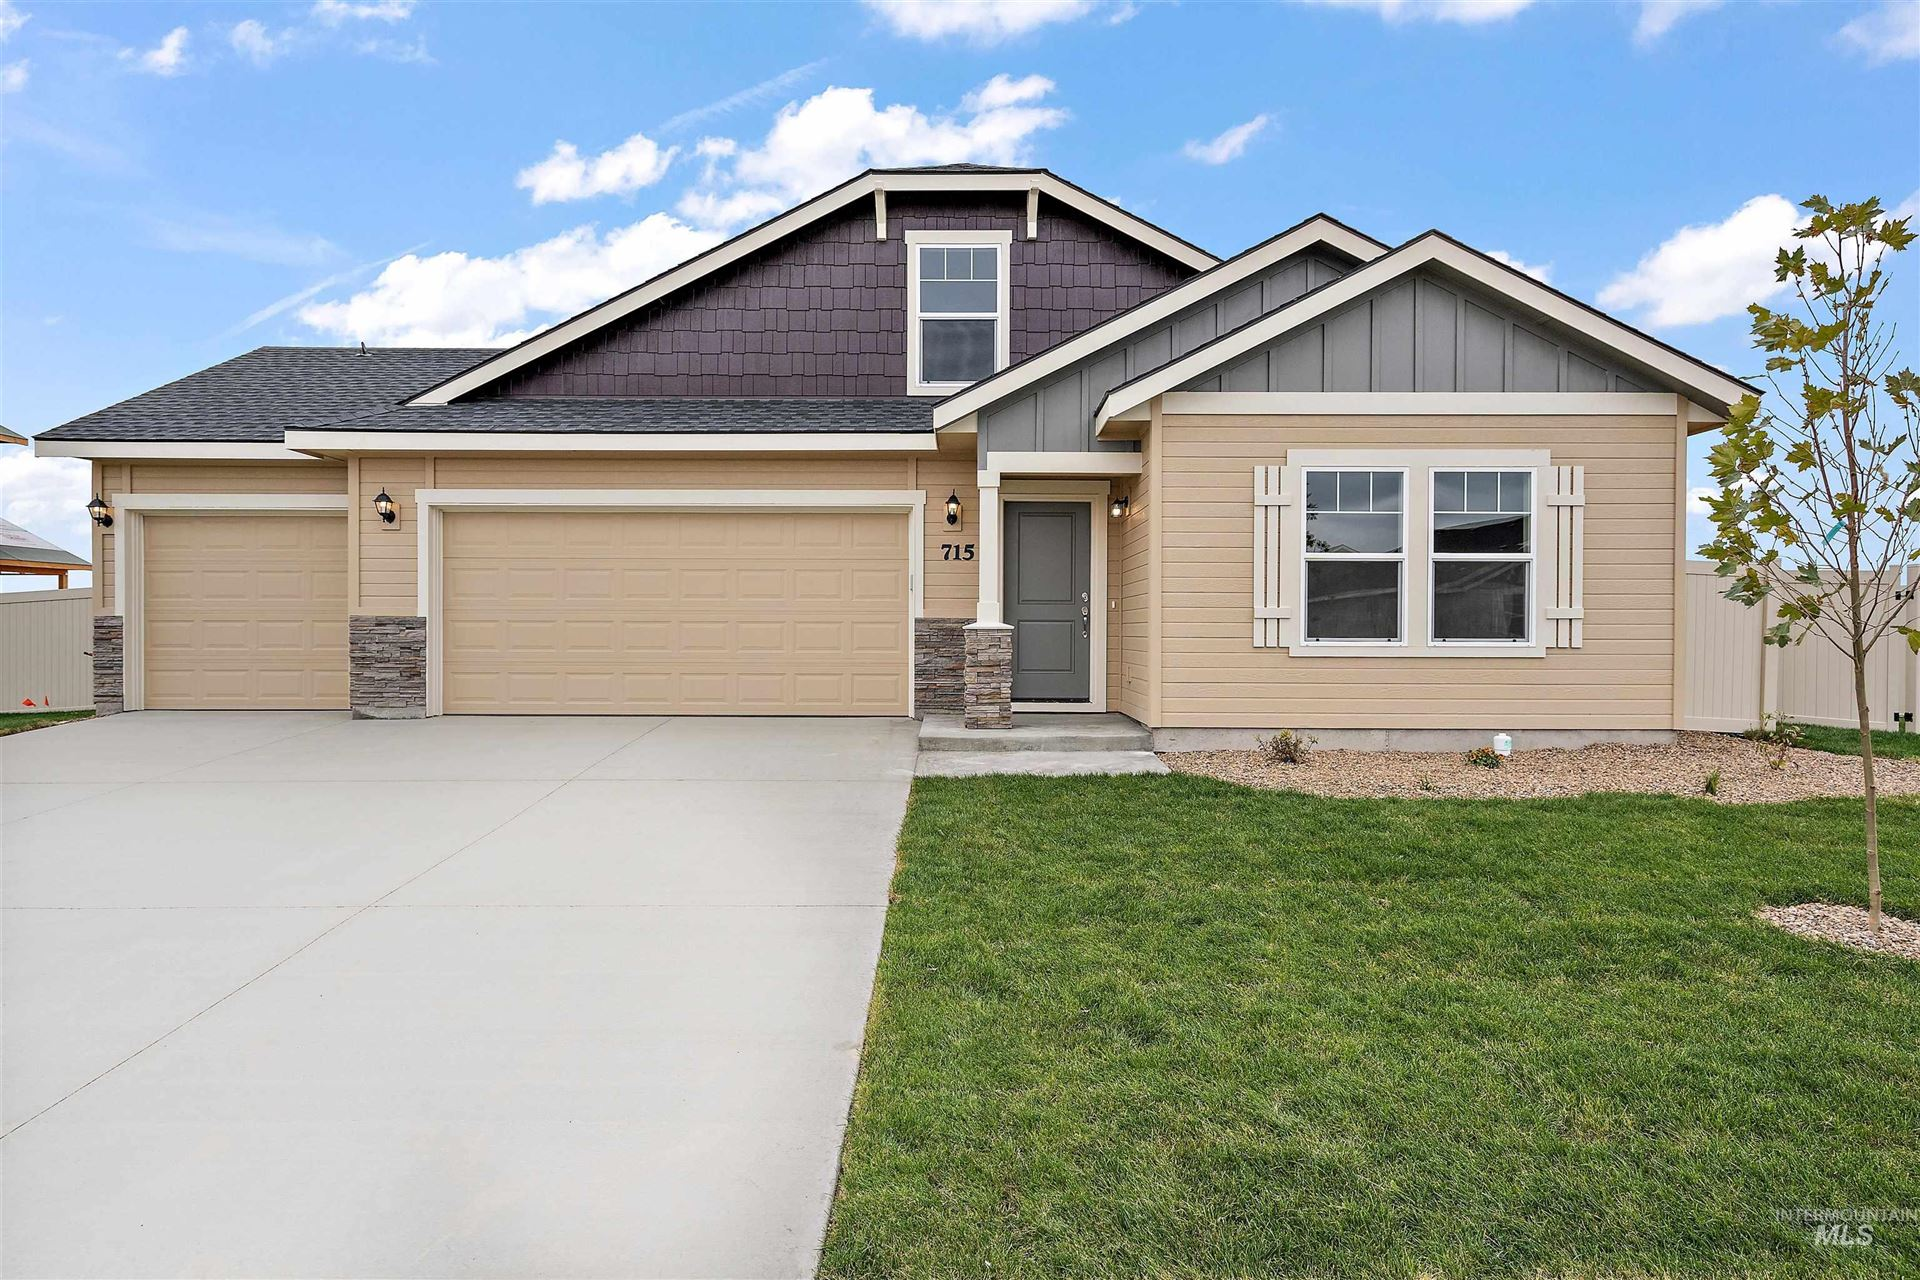 715 SW Raelynn St., Mountain Home, ID 83647 - MLS#: 98812681